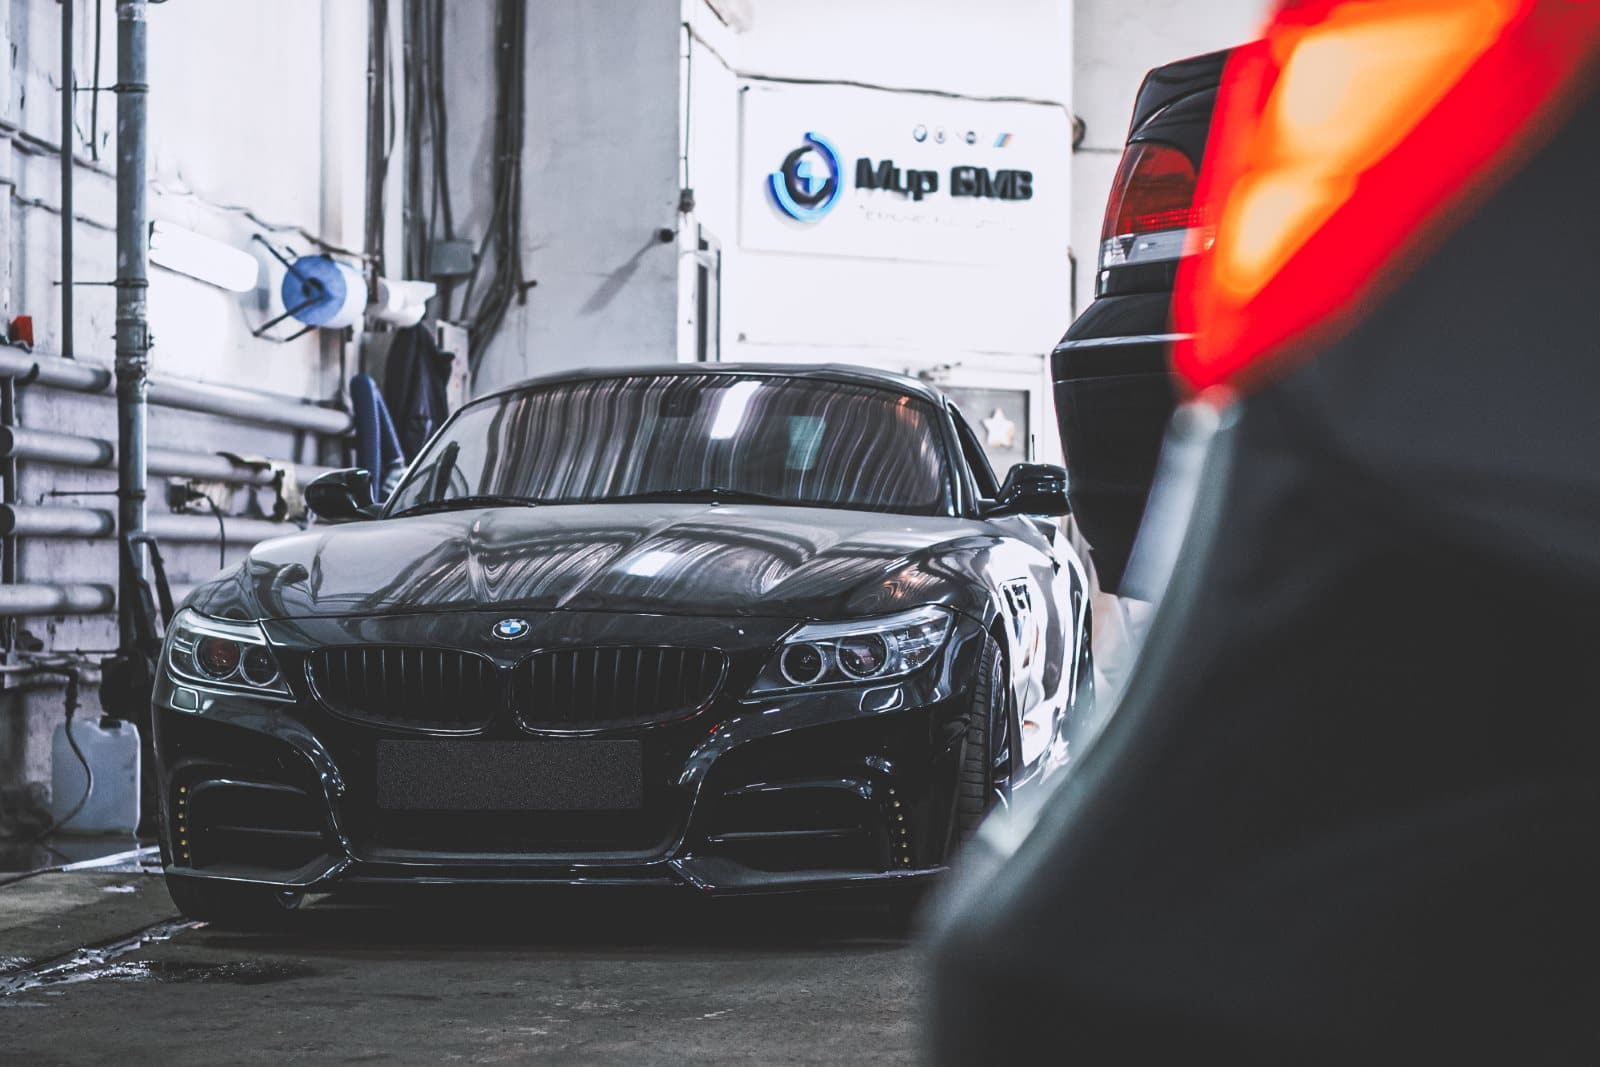 Техобслуживание BMW Z4 30i Е89 и подготовка к сезону 1